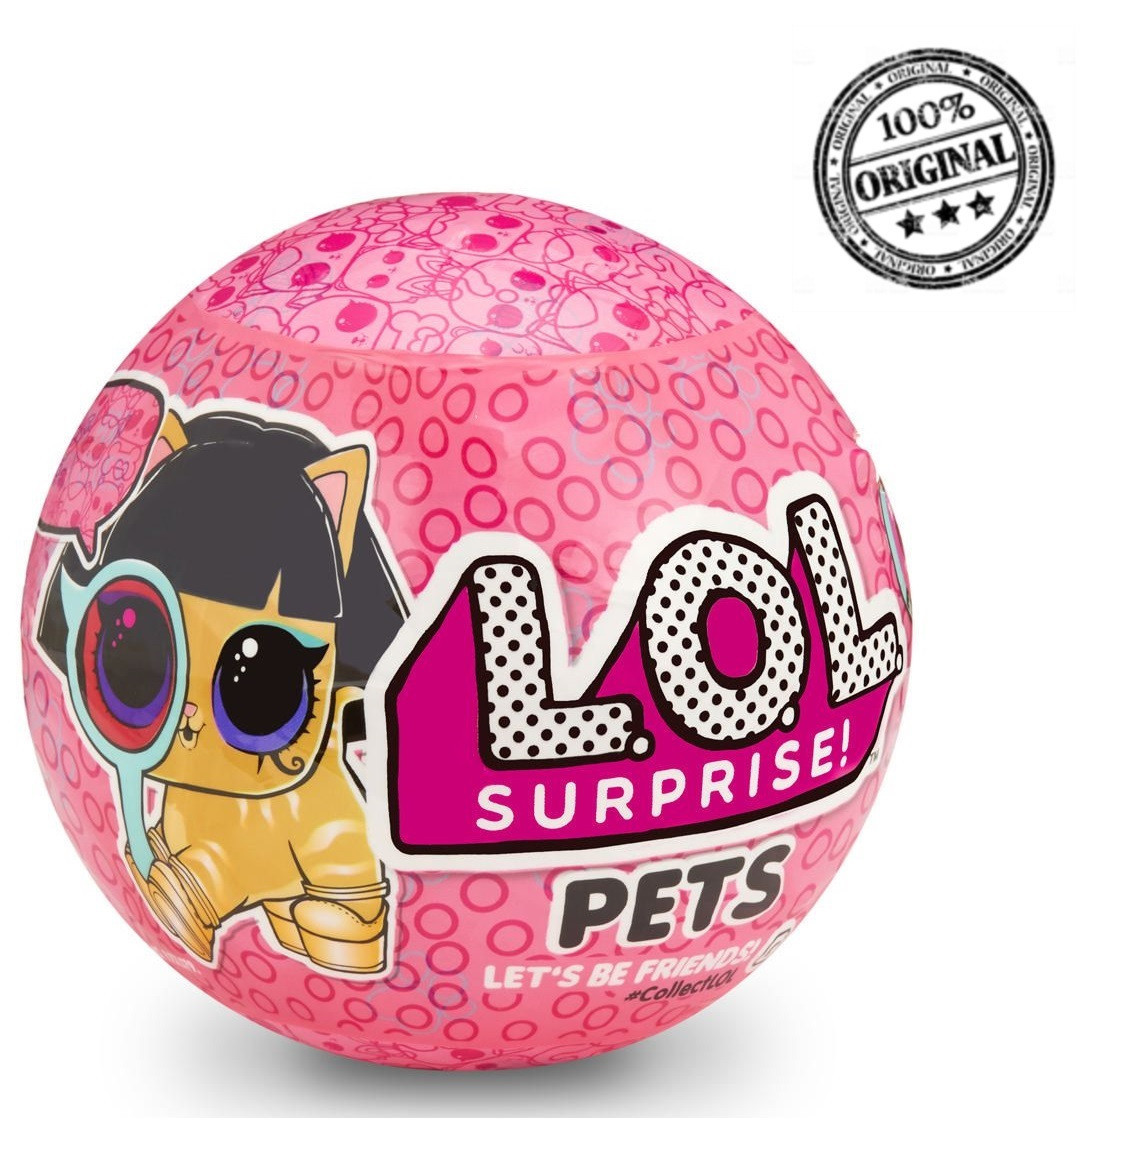 LOL Surprise - Питомец в шарике, Pets, 4 серия, 2 волна, Декодер «Eye Spy» (Оригинал), ЛОЛ Сюрприз